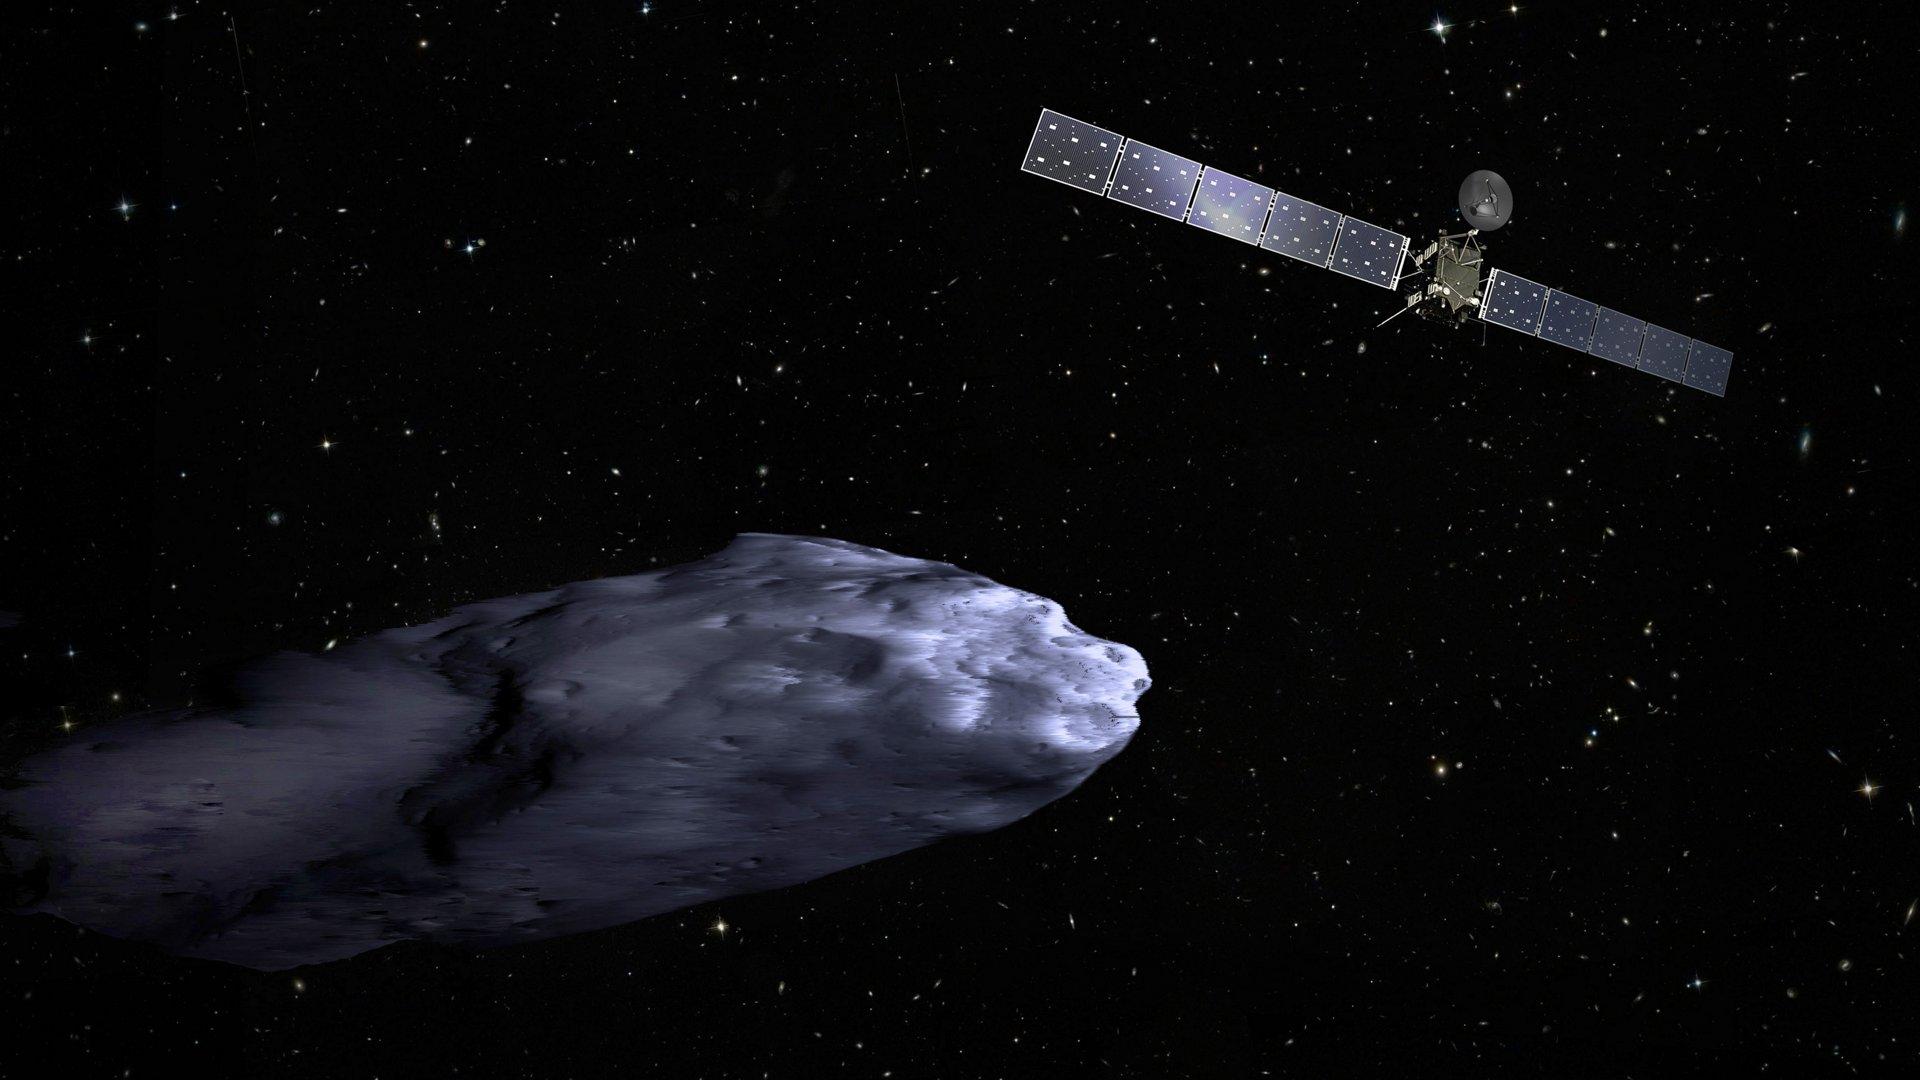 Rosetta, the comet probe, approaching the comet 67P/ Churyumov-Gerasimenko